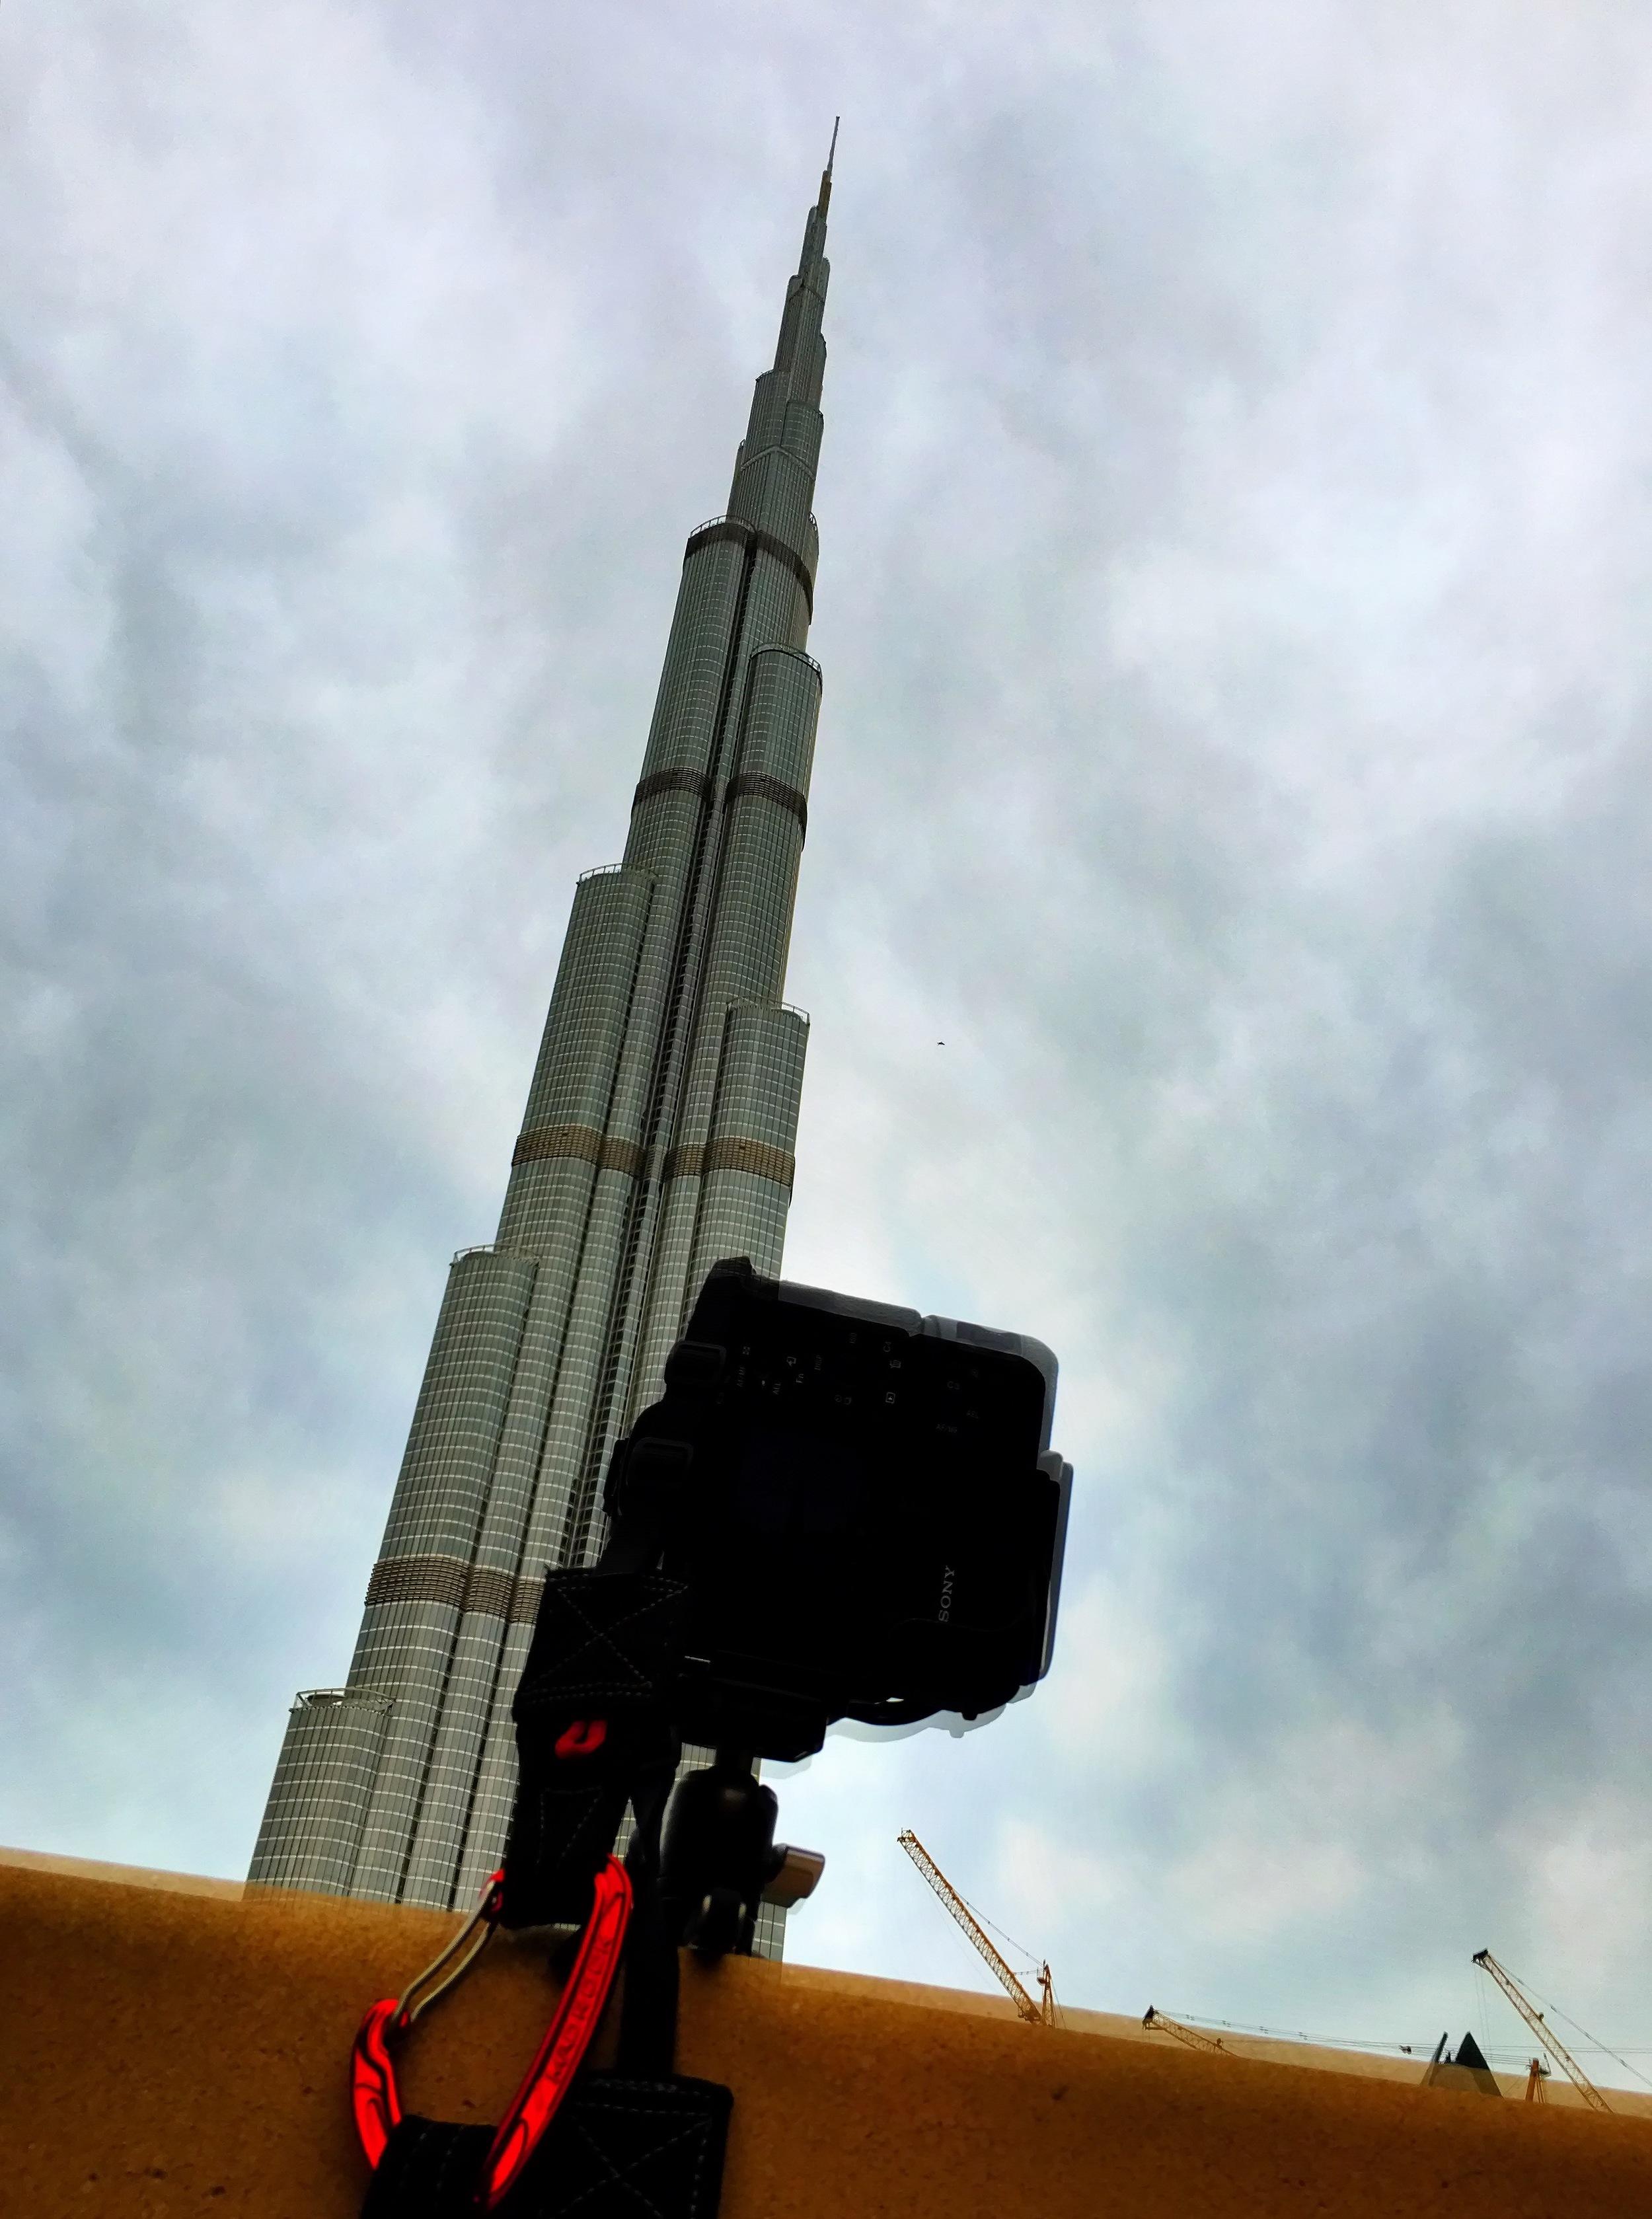 Richard Harrington sent us this picture of his trip to Dubai